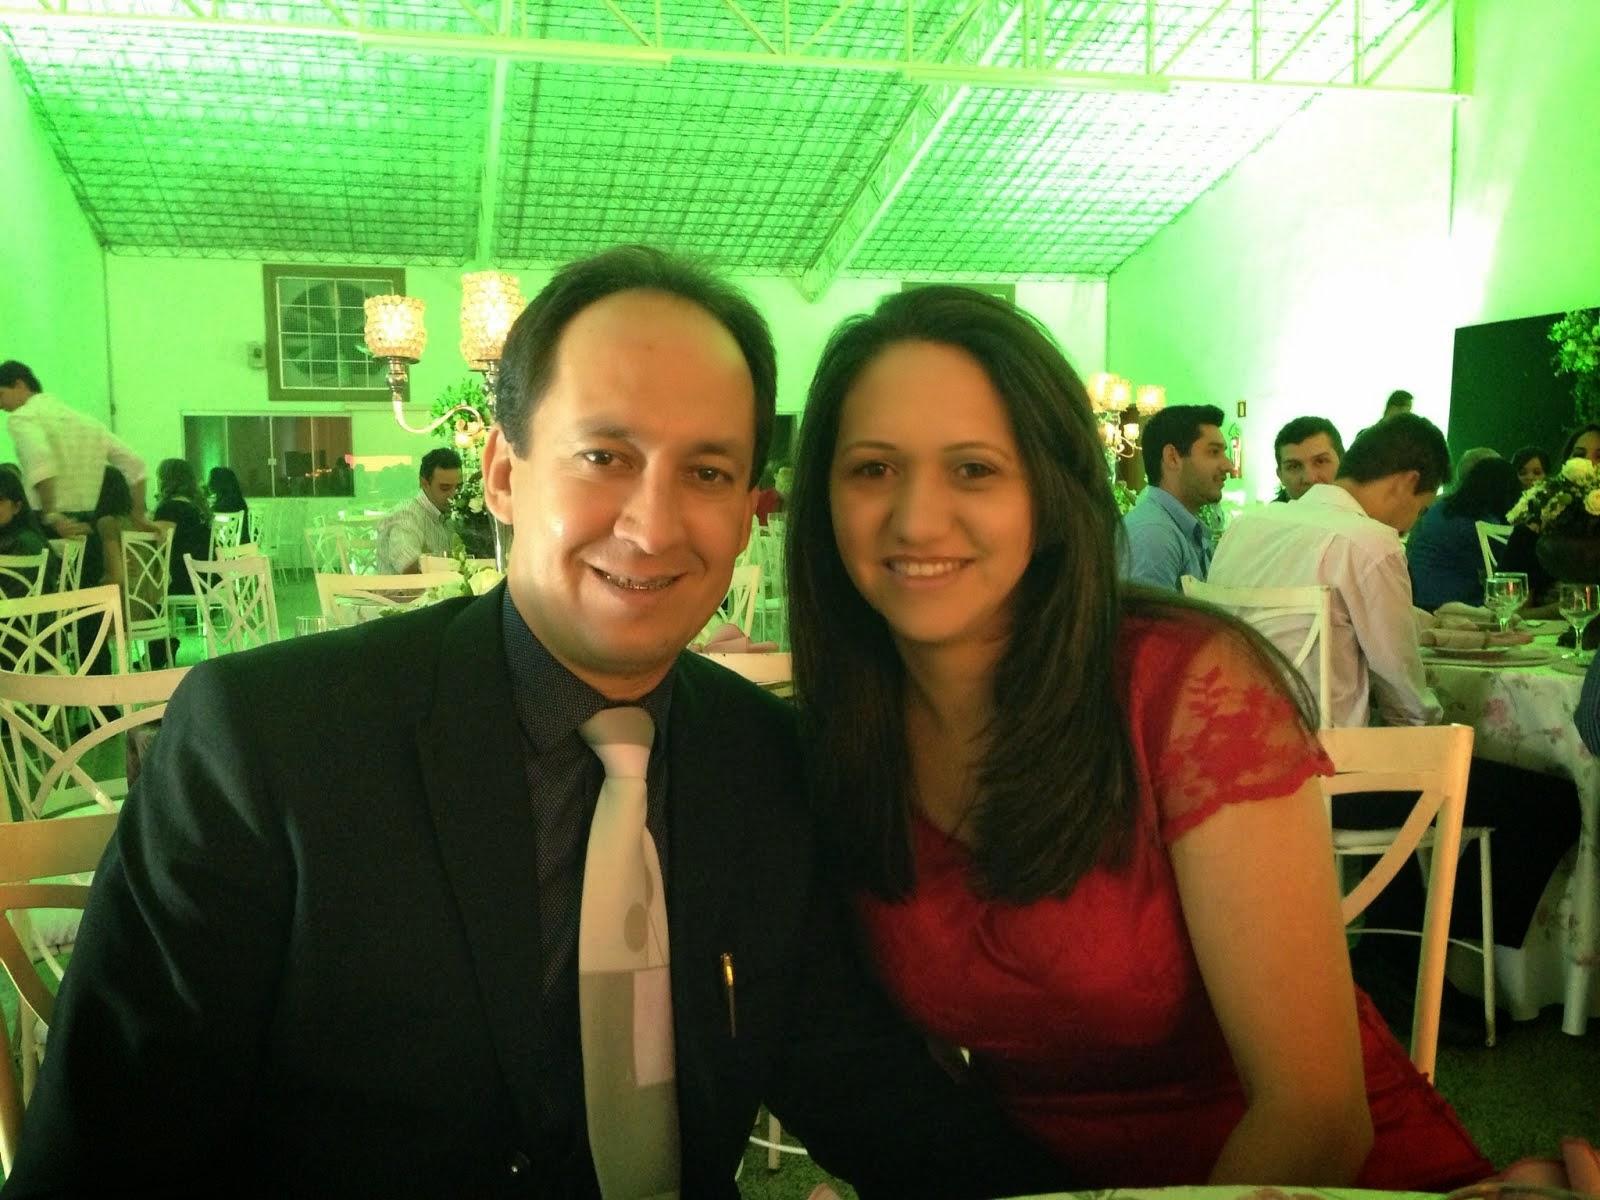 Pr. Cézar Carrijo e Missª Gláucia